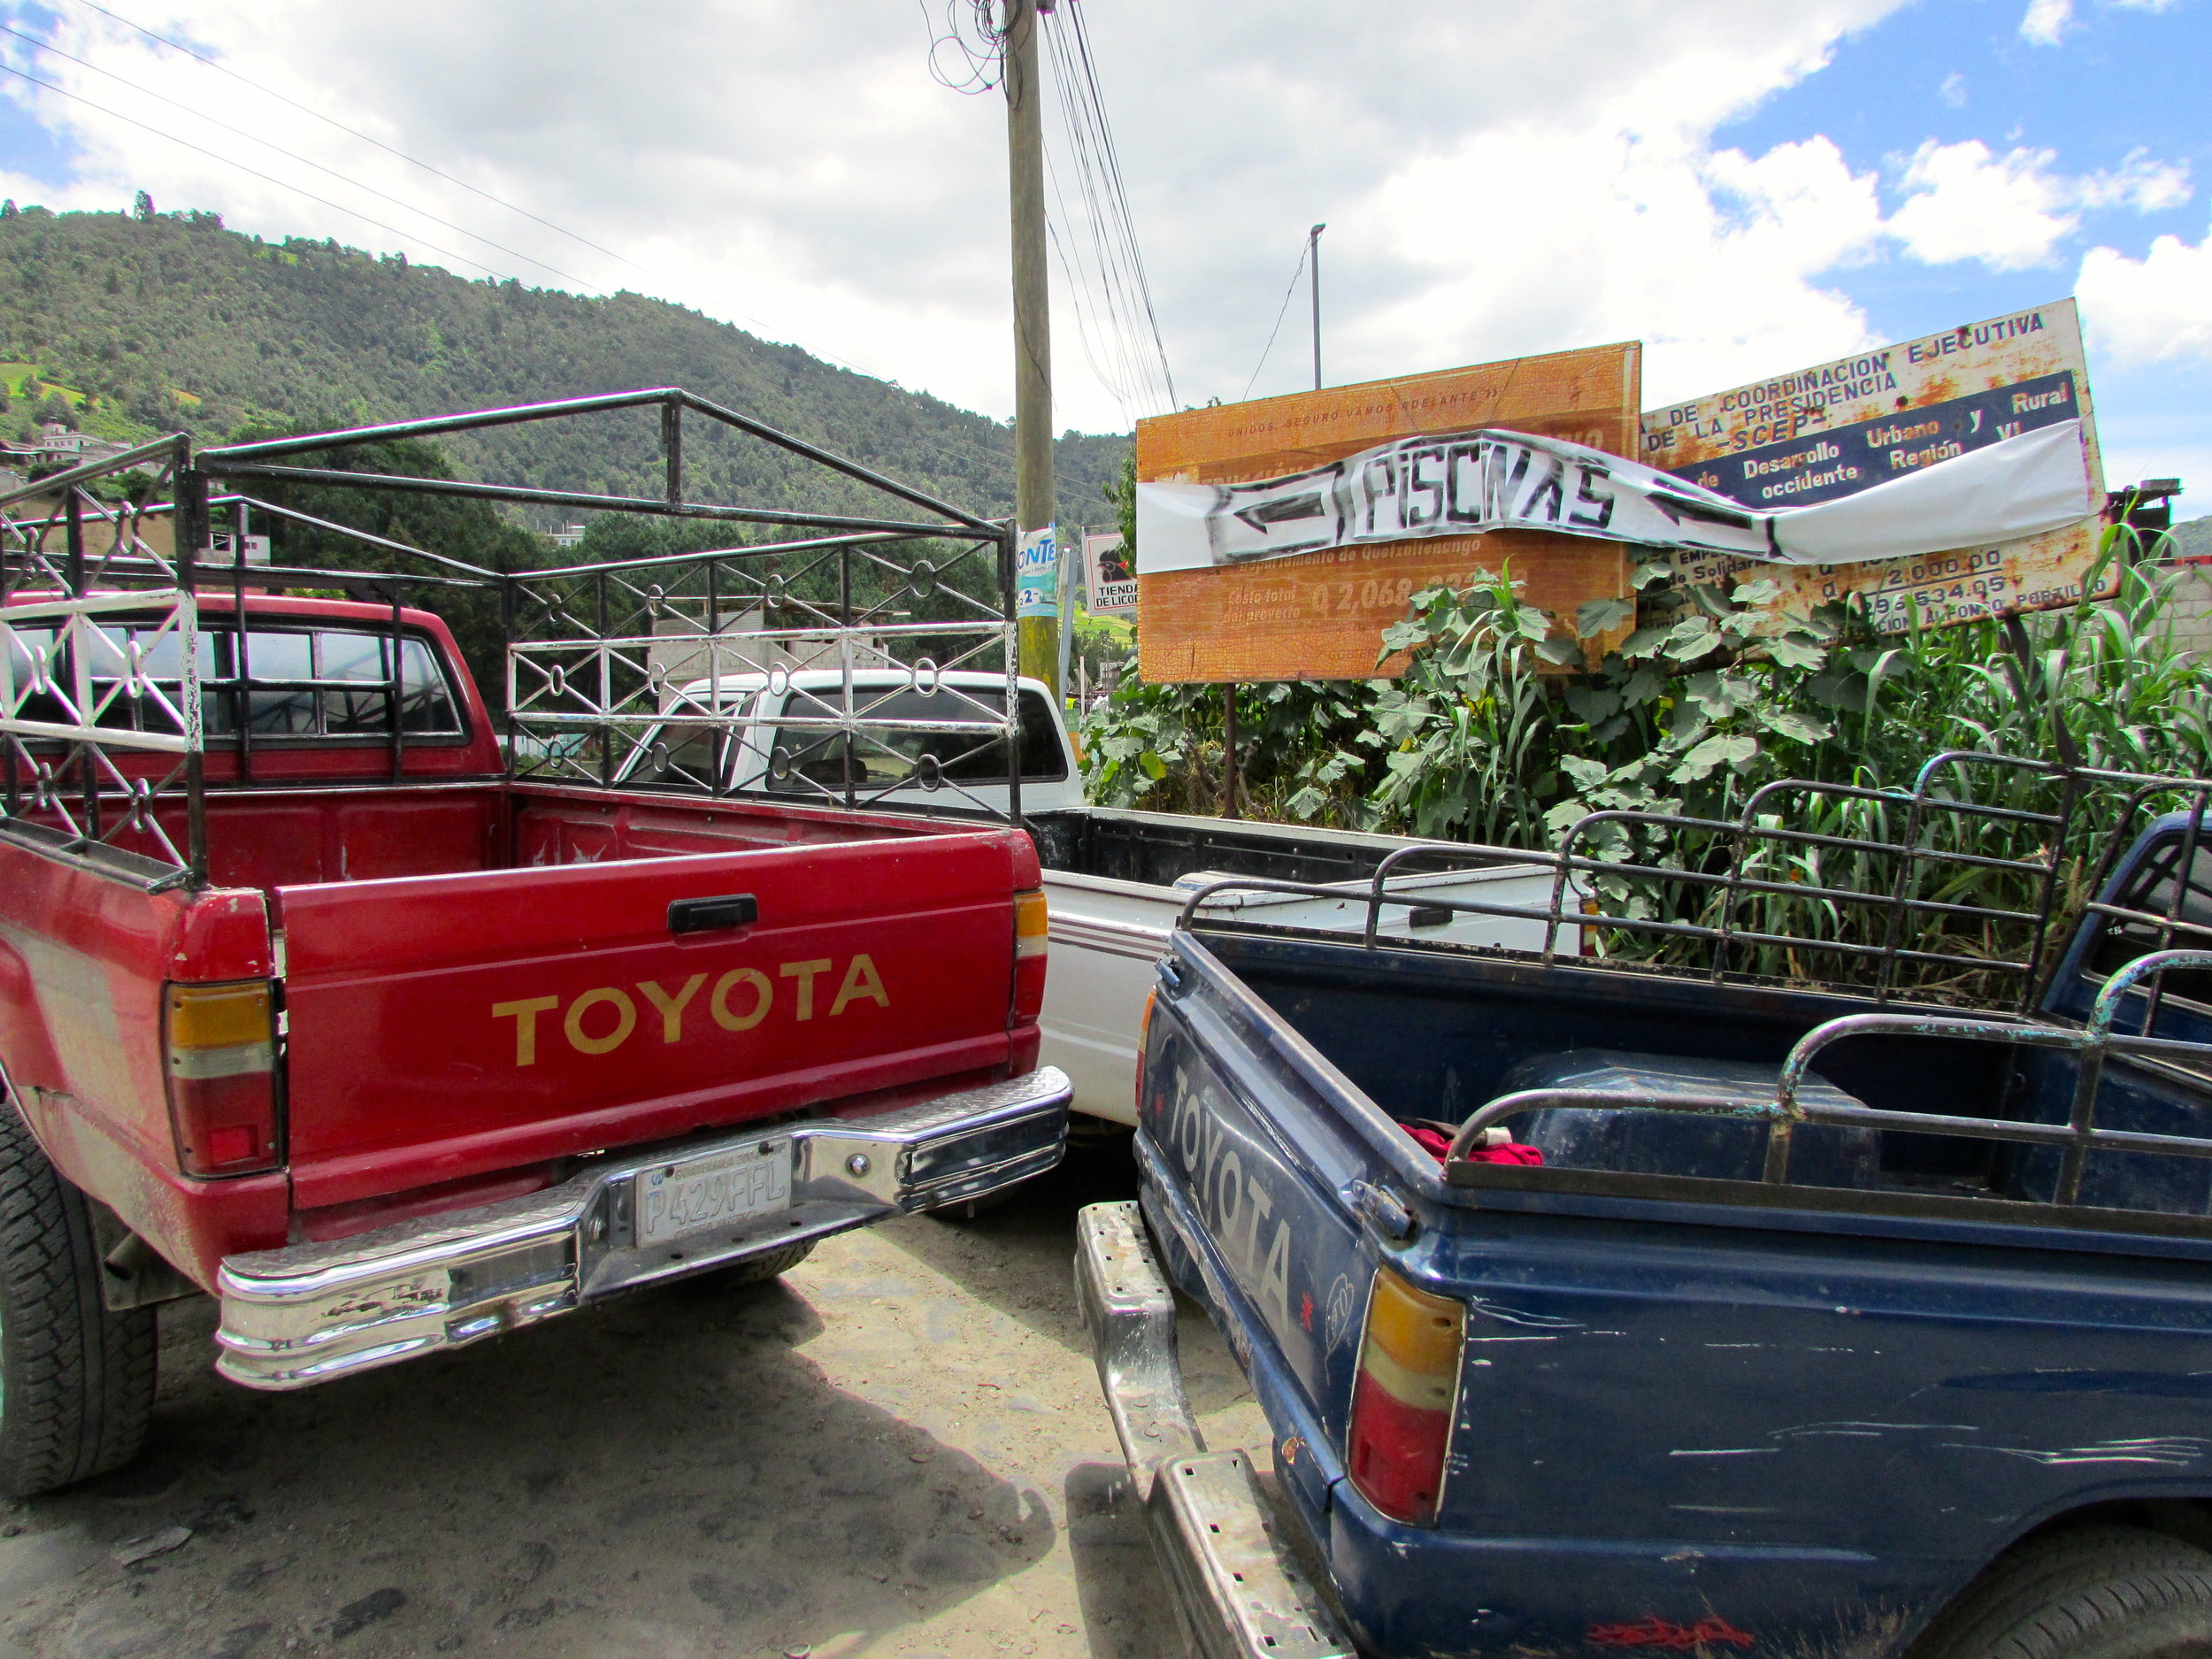 Vehicles in Almolonga. Photo credits: Giovanni Batz